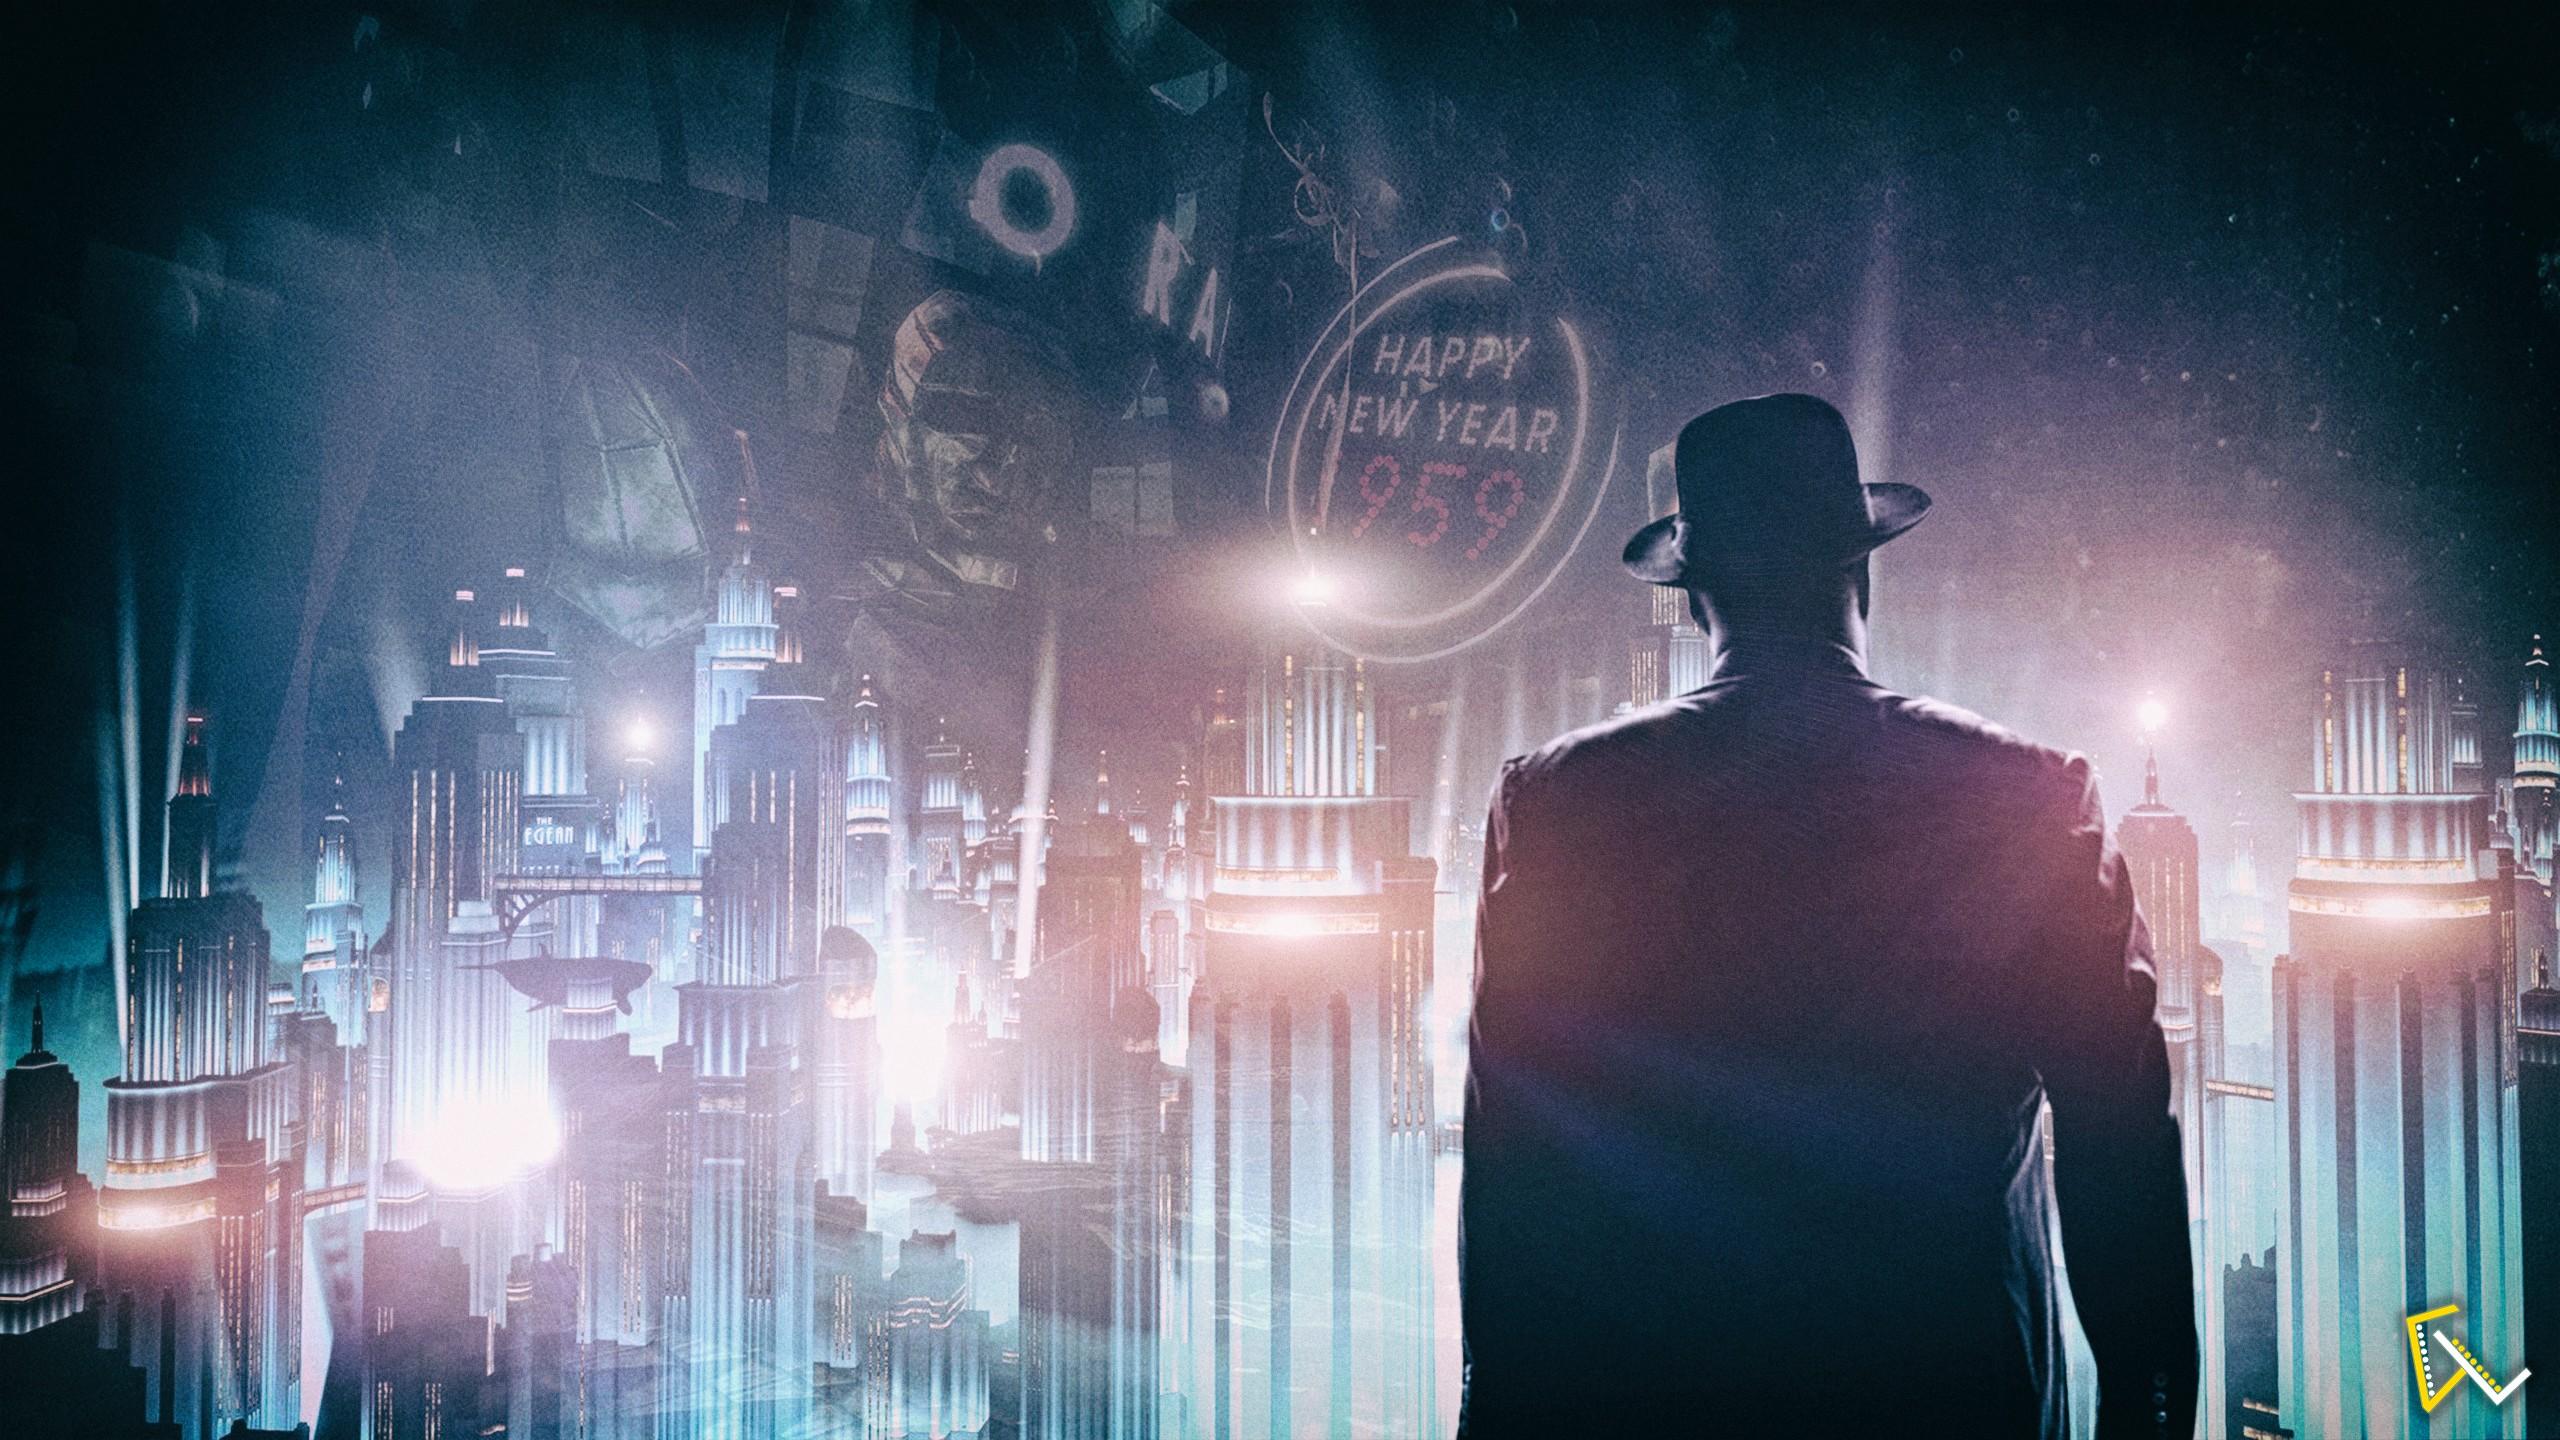 BioShock Infinite Burial At Sea Video Games Cityscape Rapture Digital Art Photoshop